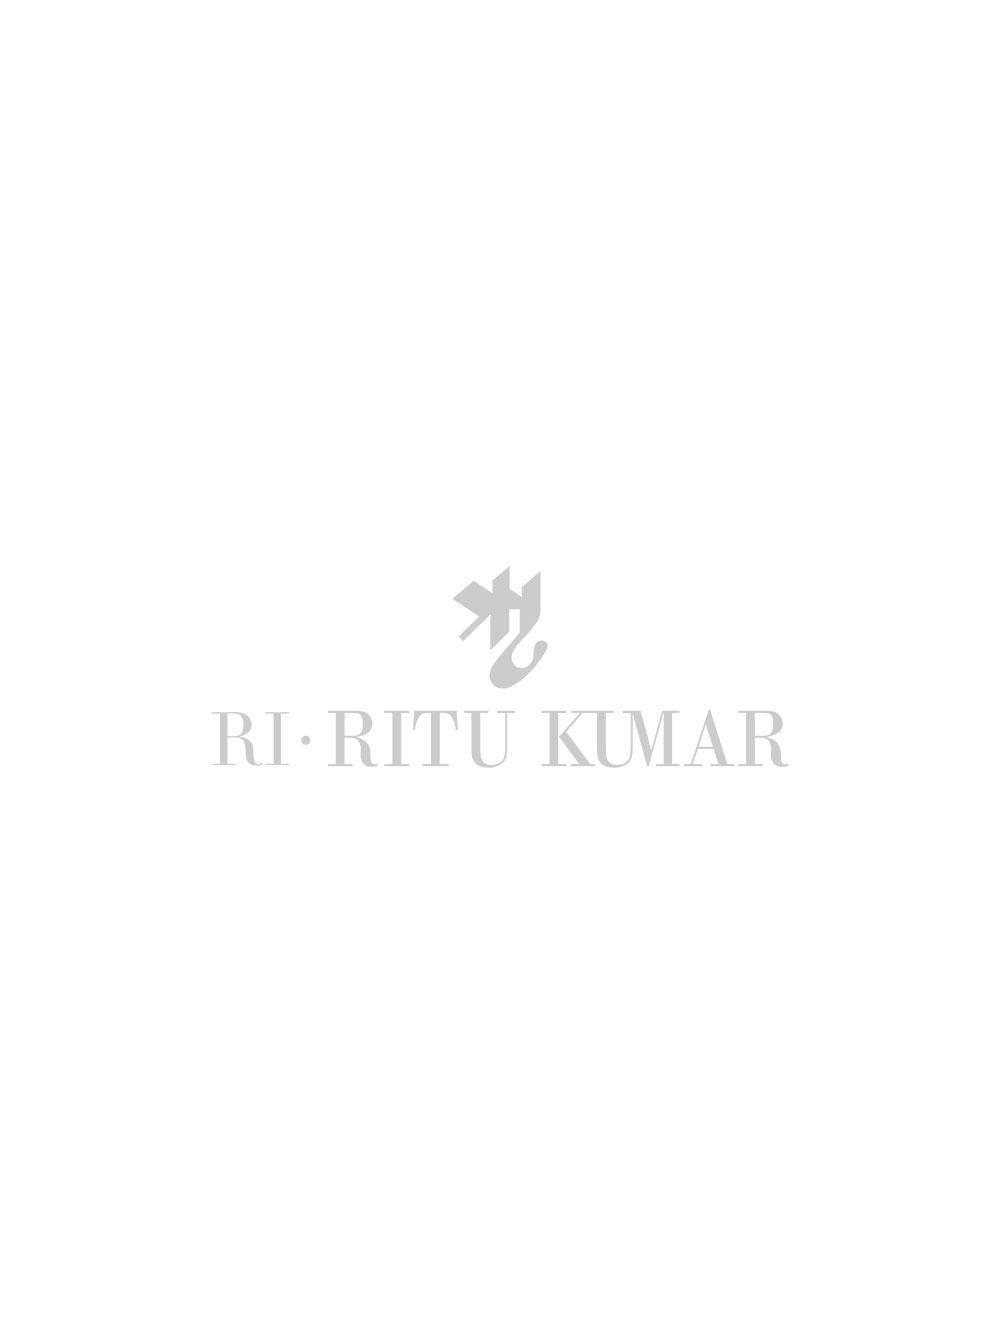 Grey Embroidered Kurta With Dupatta And Churidar